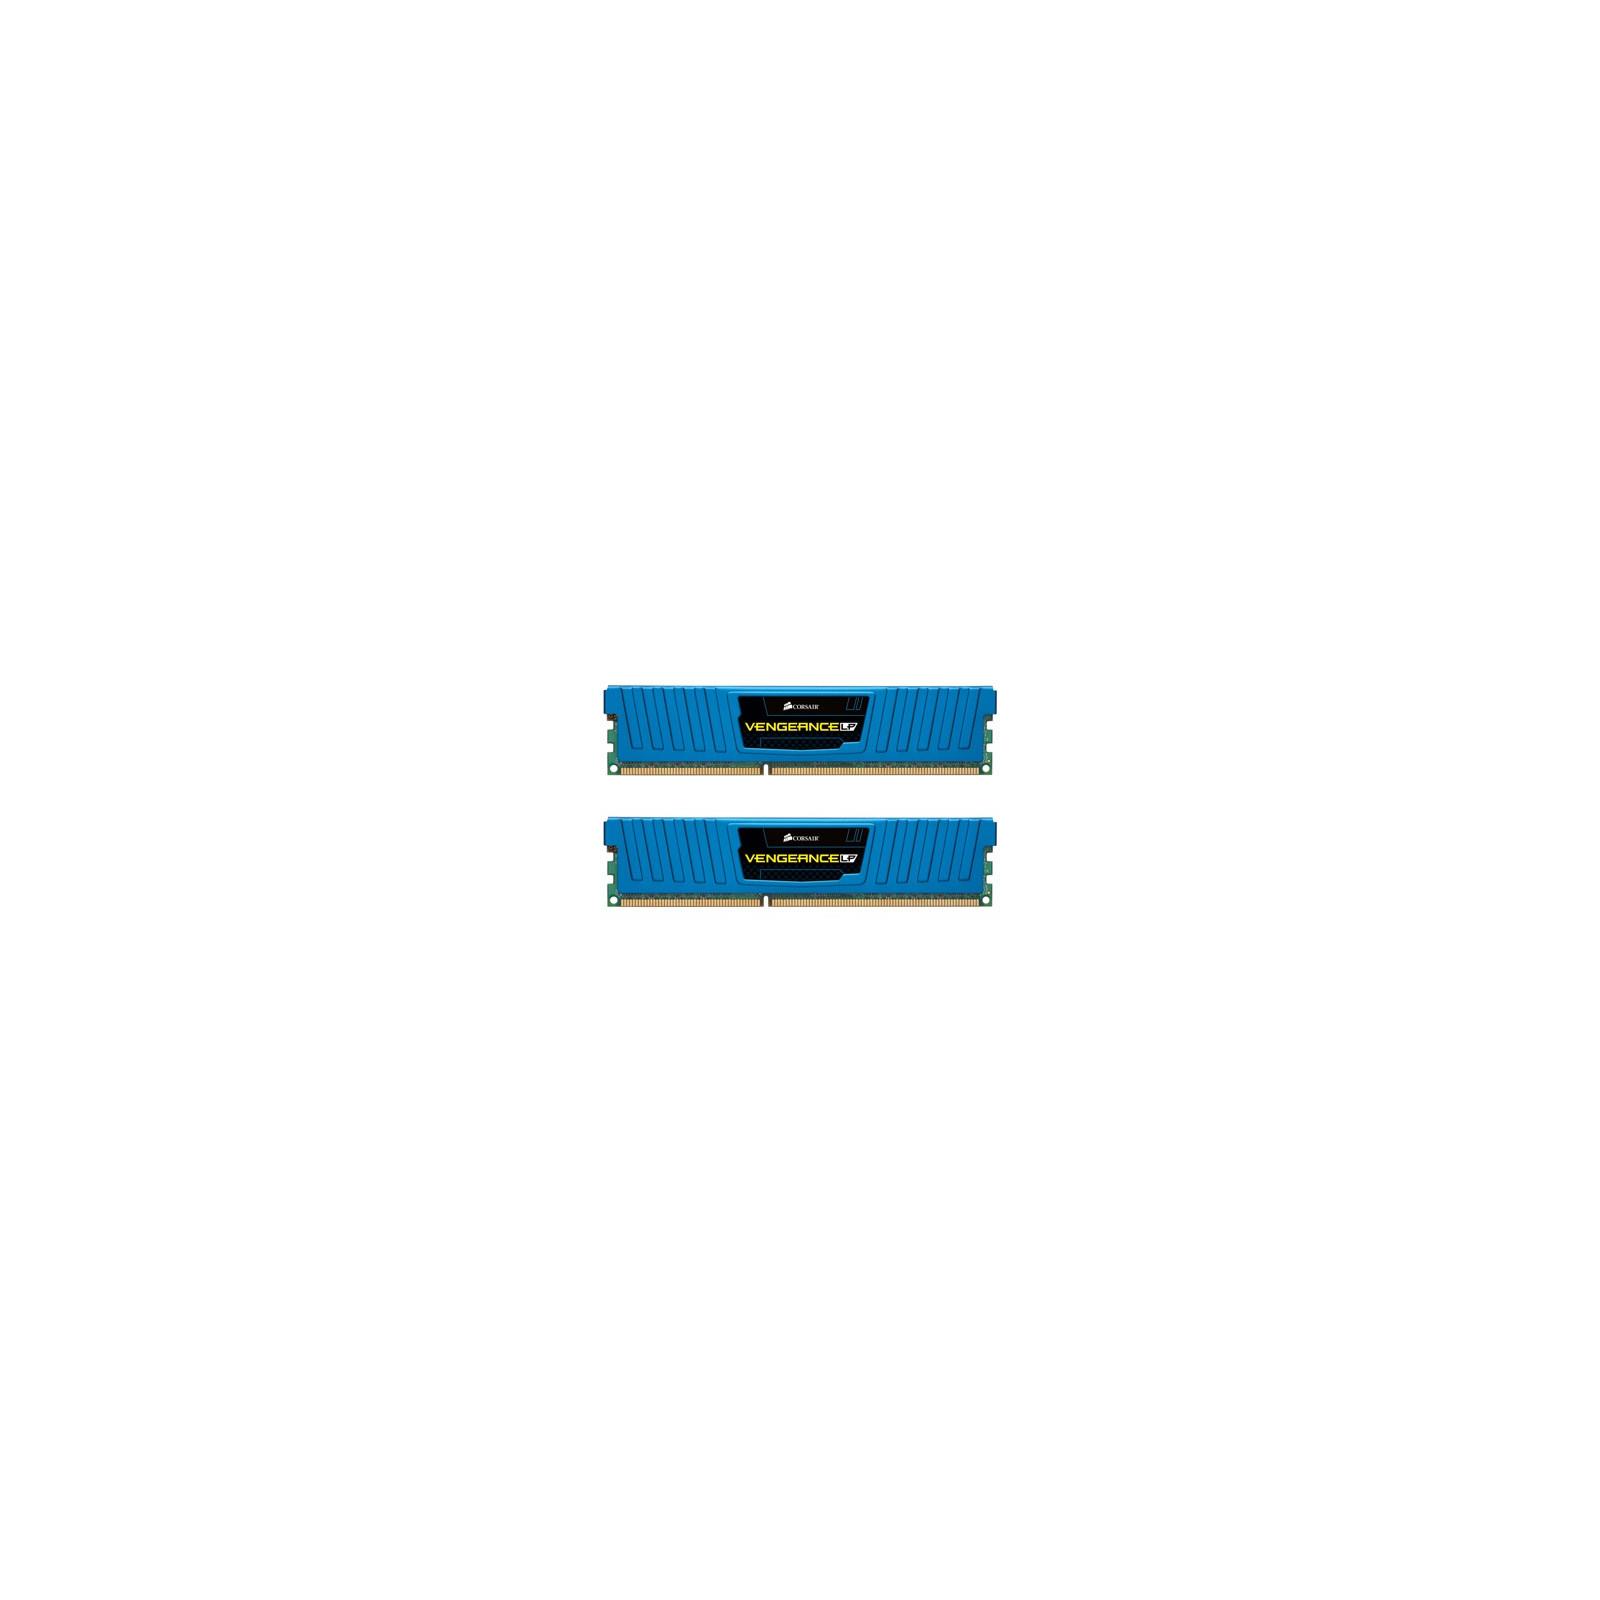 Модуль памяти для компьютера DDR3 8GB (2x4GB) 1600 MHz CORSAIR (CML8GX3M2A1600C9)